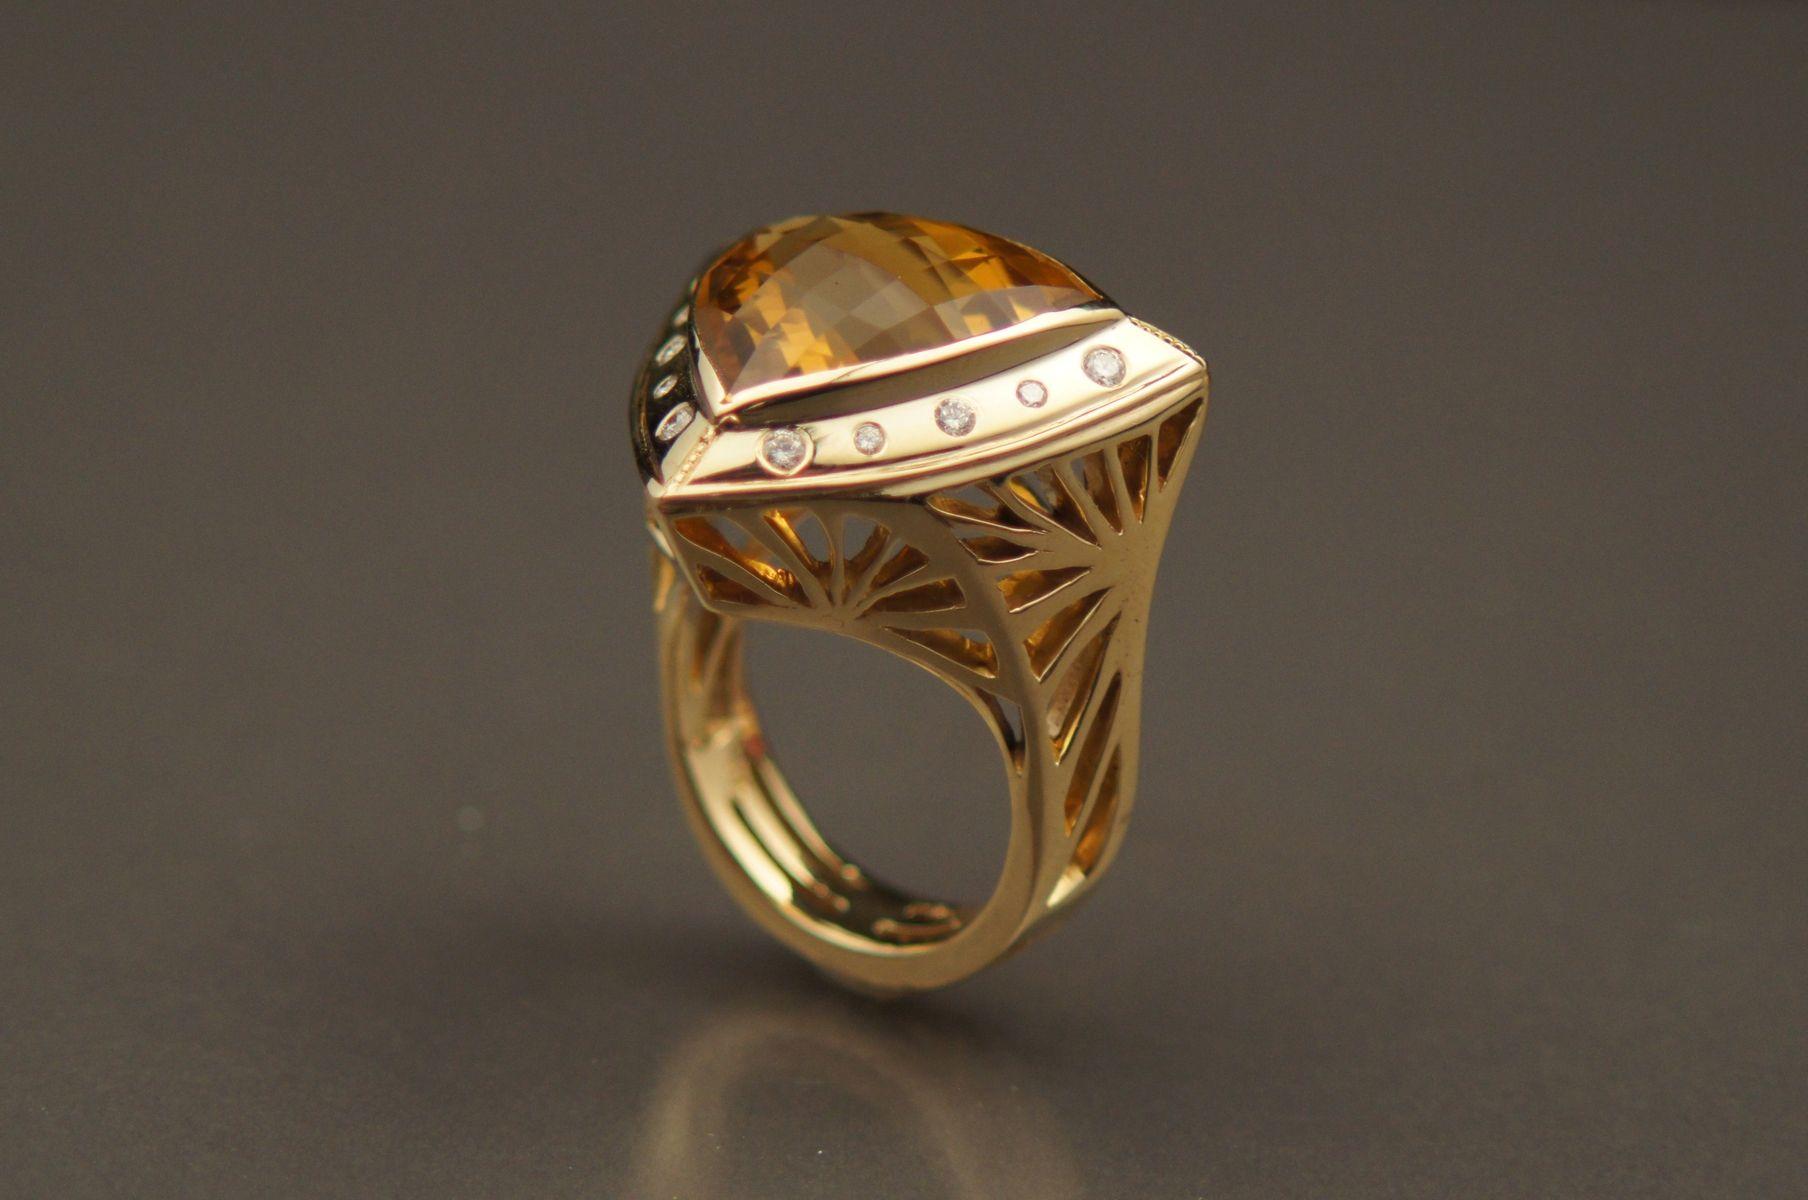 Buy A Custom Citrine Diamond Ring In 14kt Yellow Gold